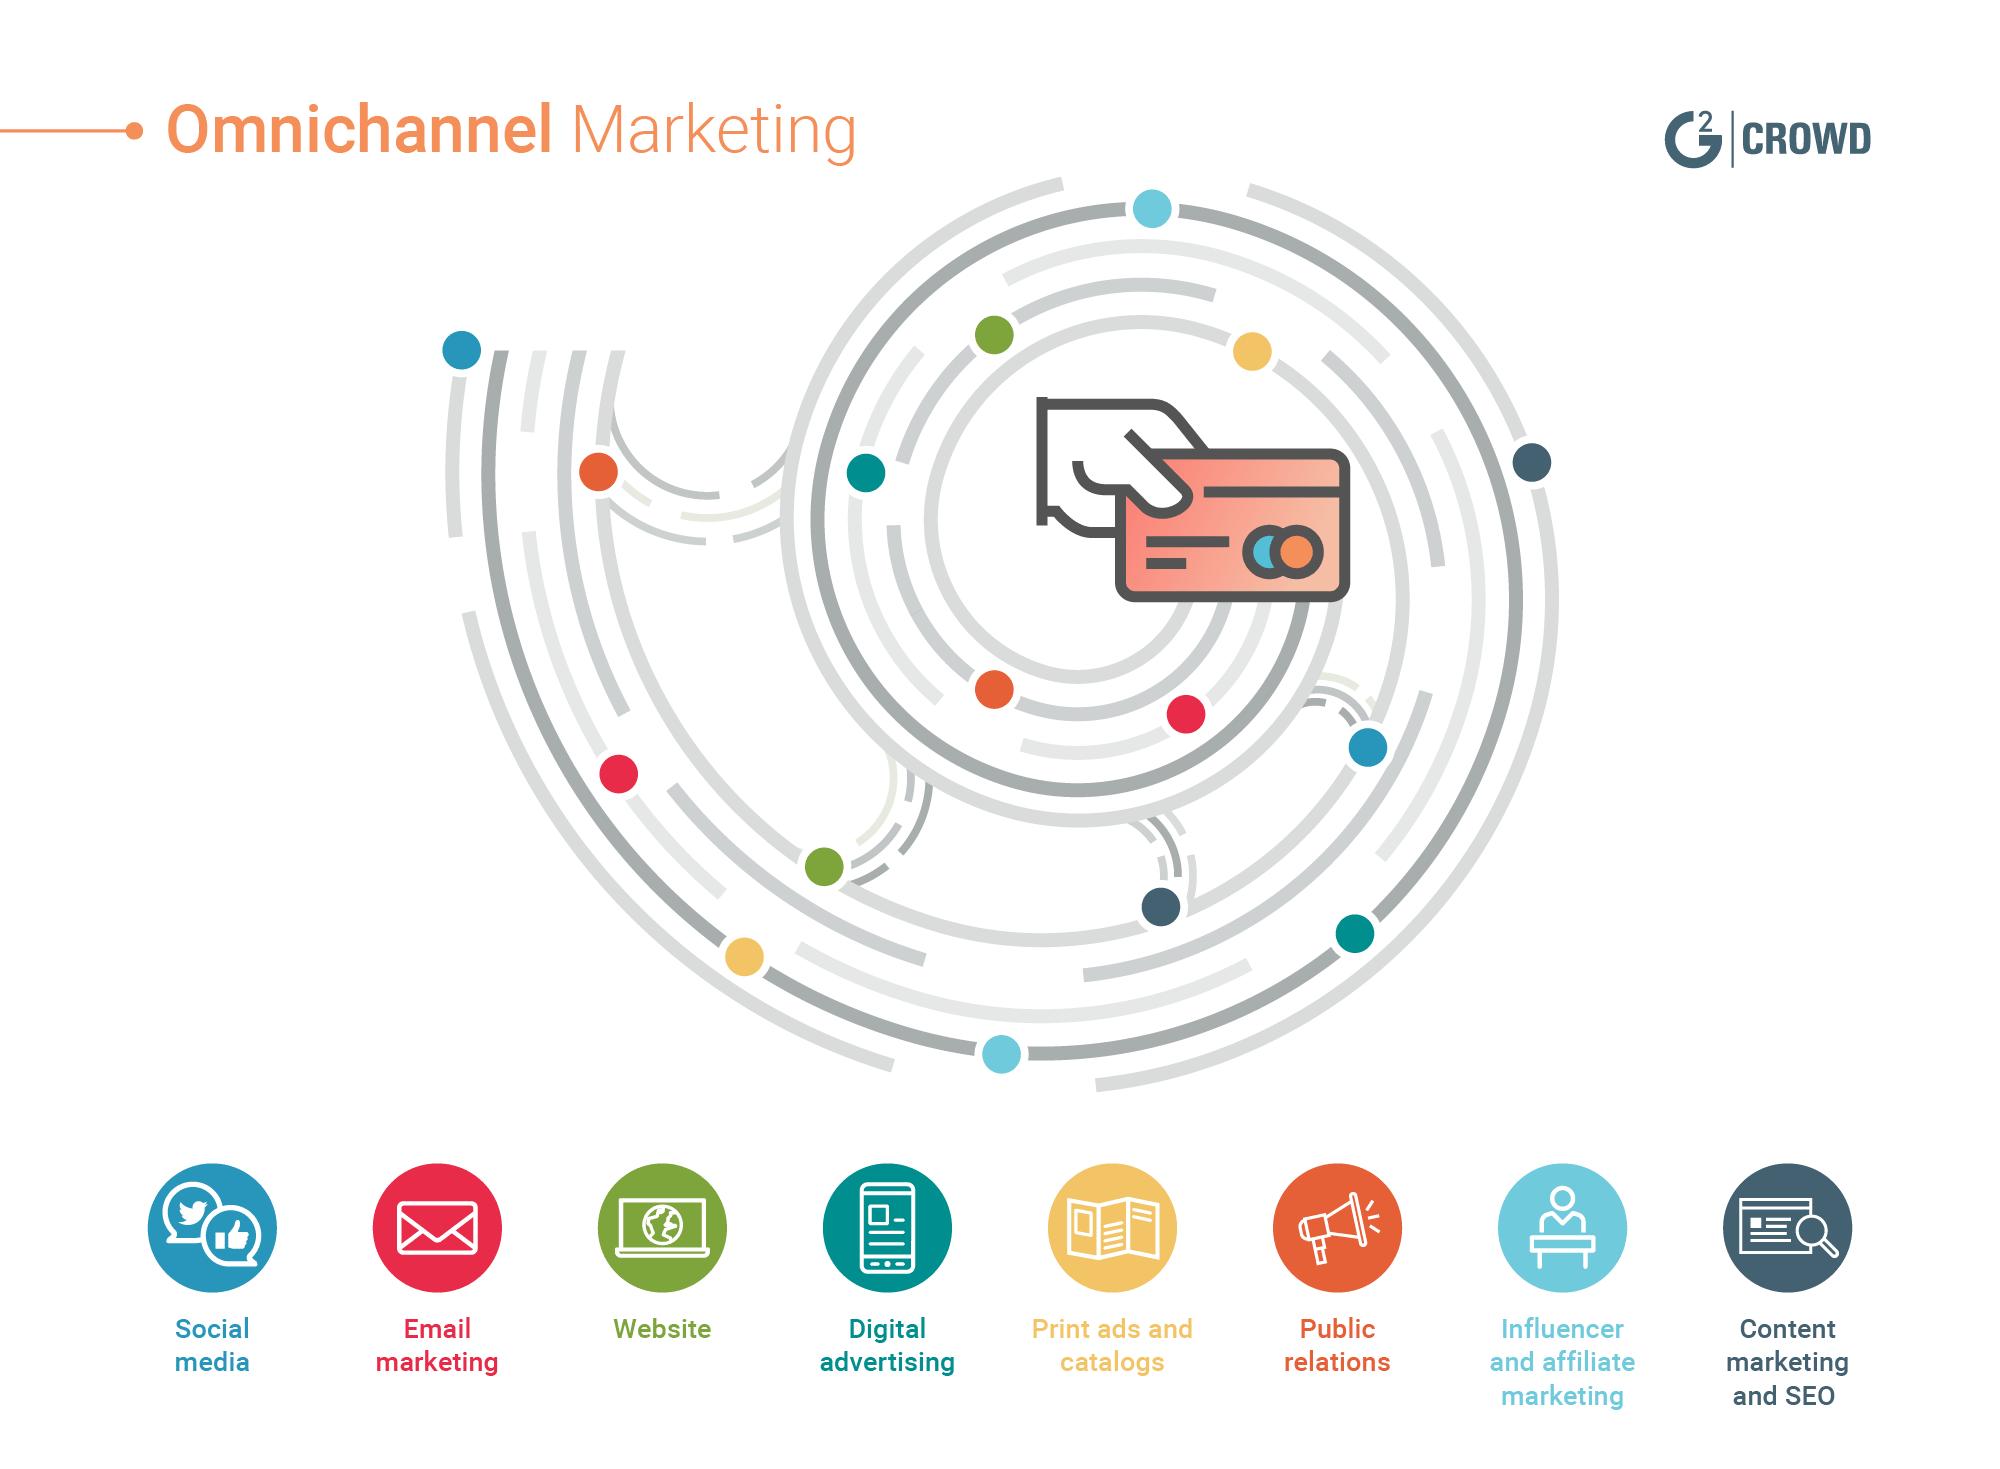 omnichannel-marketing